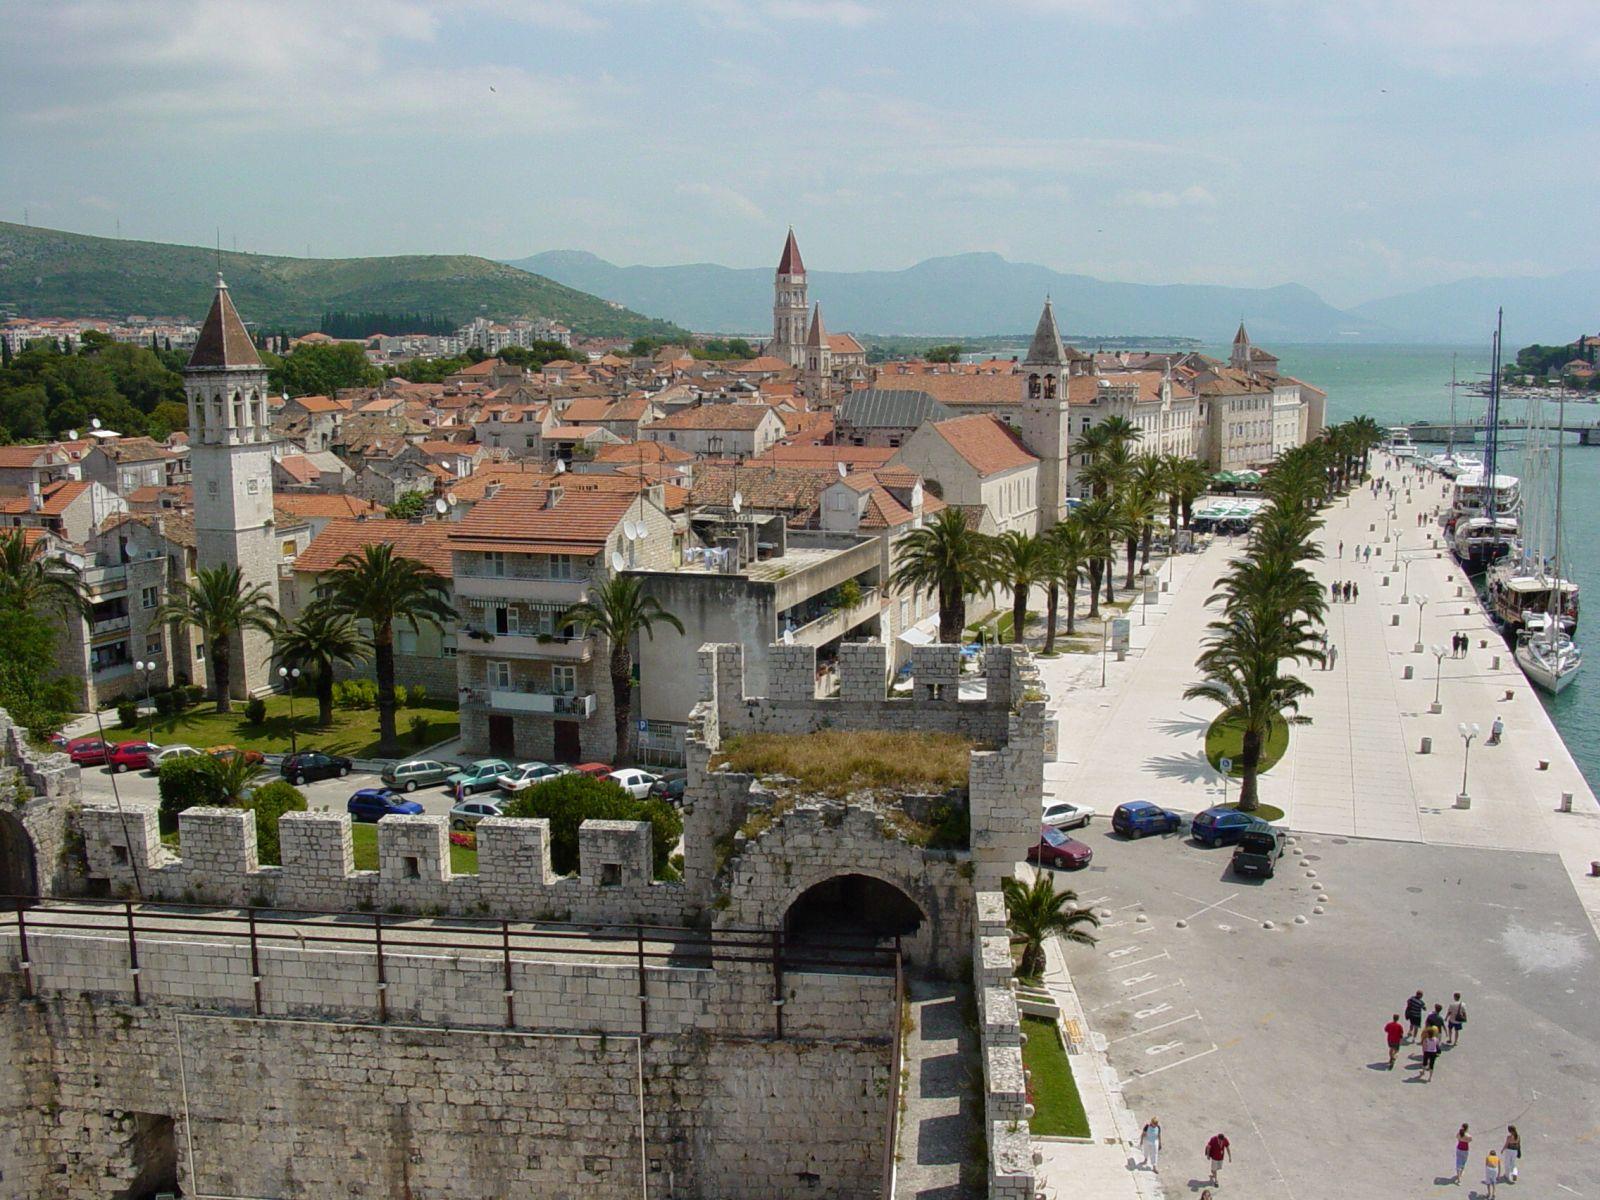 Najbolje od srednje i sjeverne Dalmacije: Trogir